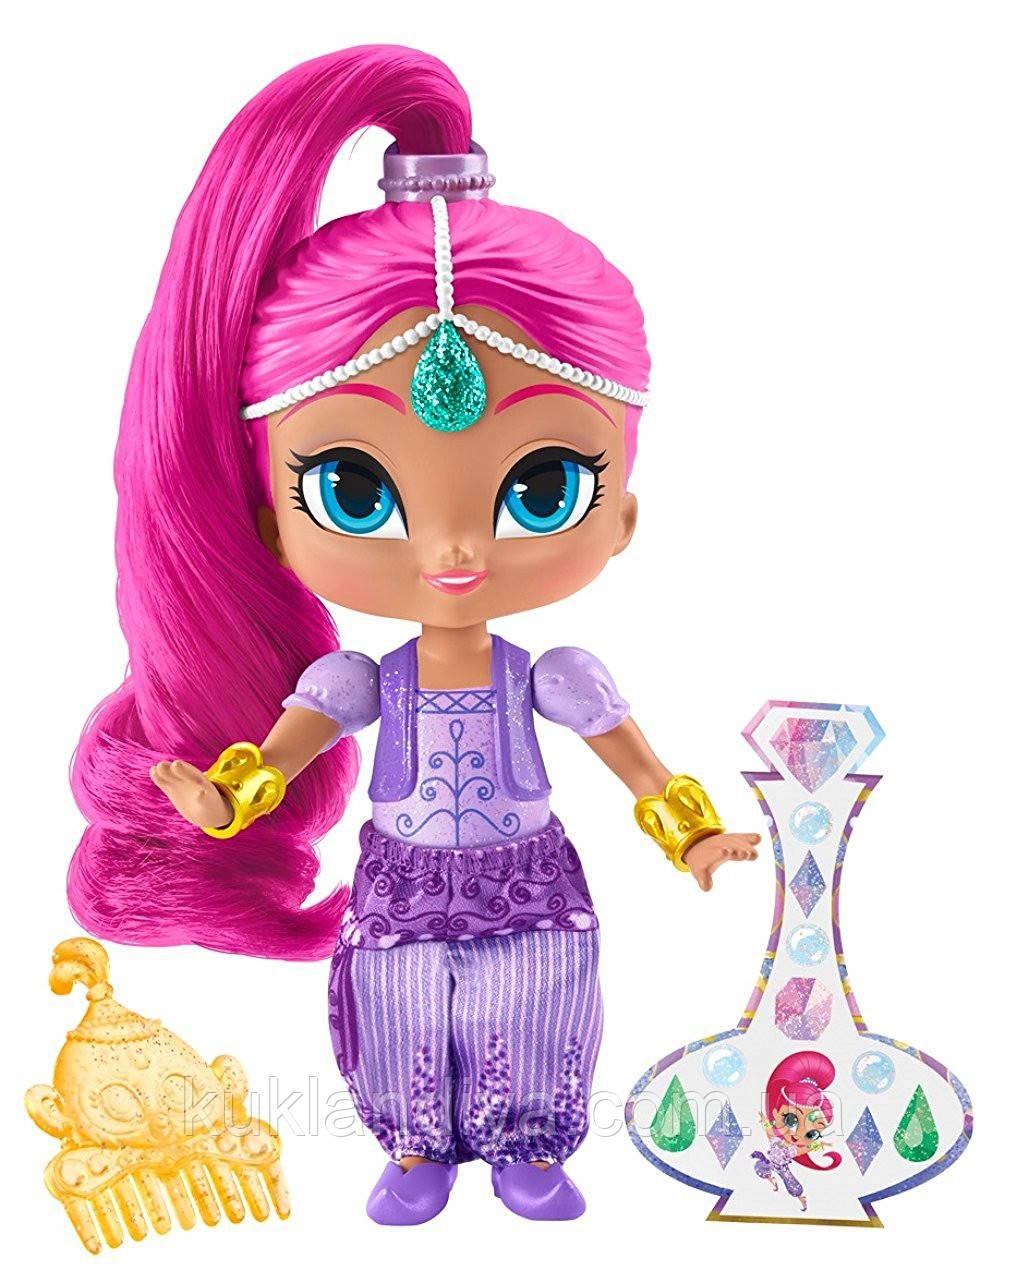 Кукла Шиммер - Shimmer and Shine Fisher-Price 15 см